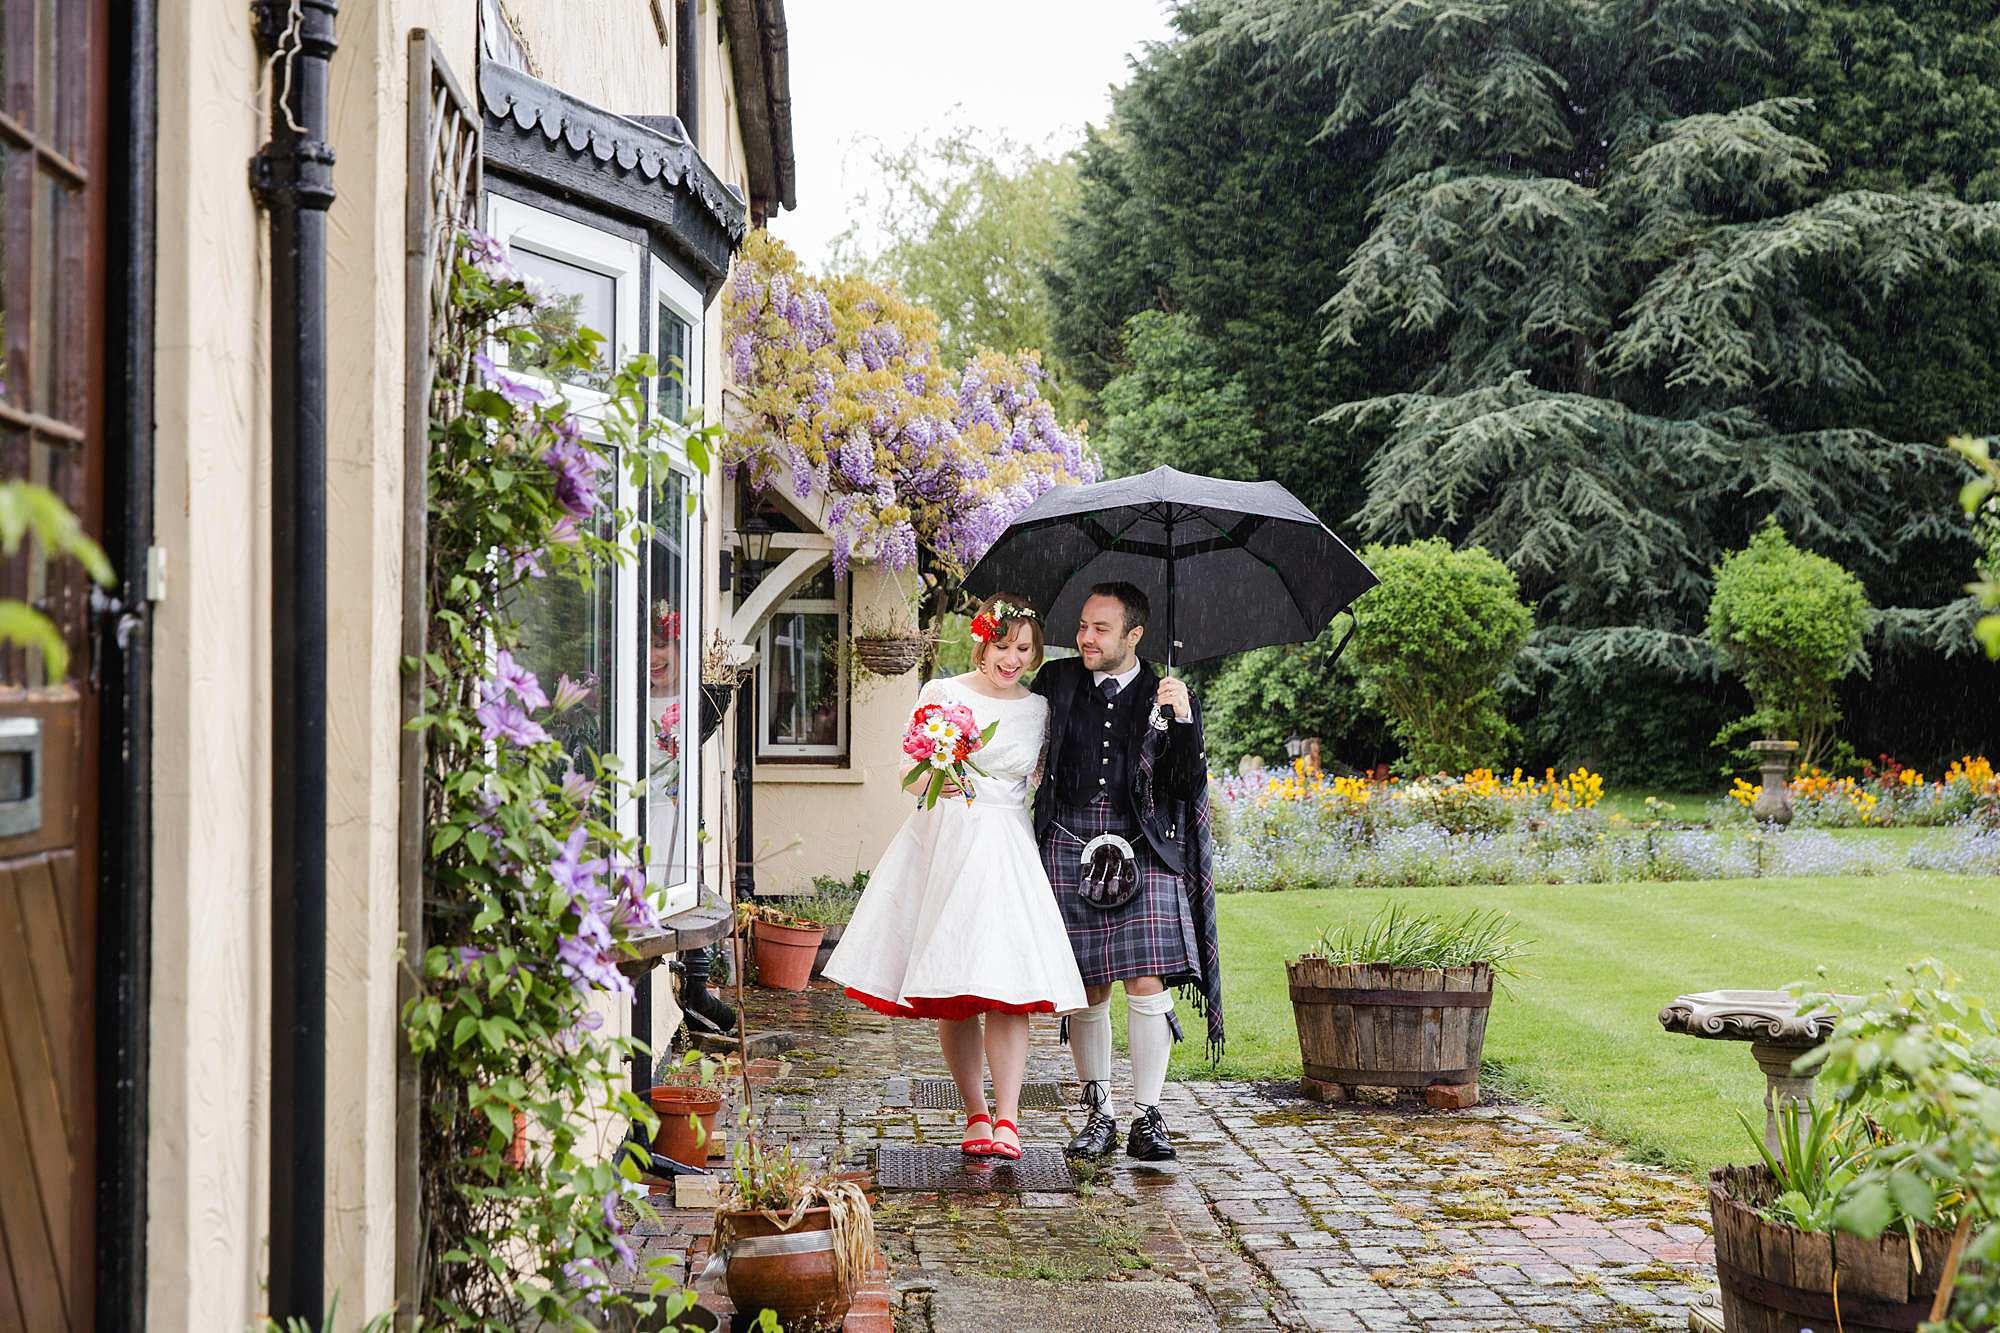 bride and groom smile and walk under umbrellas at norwood farm wedding